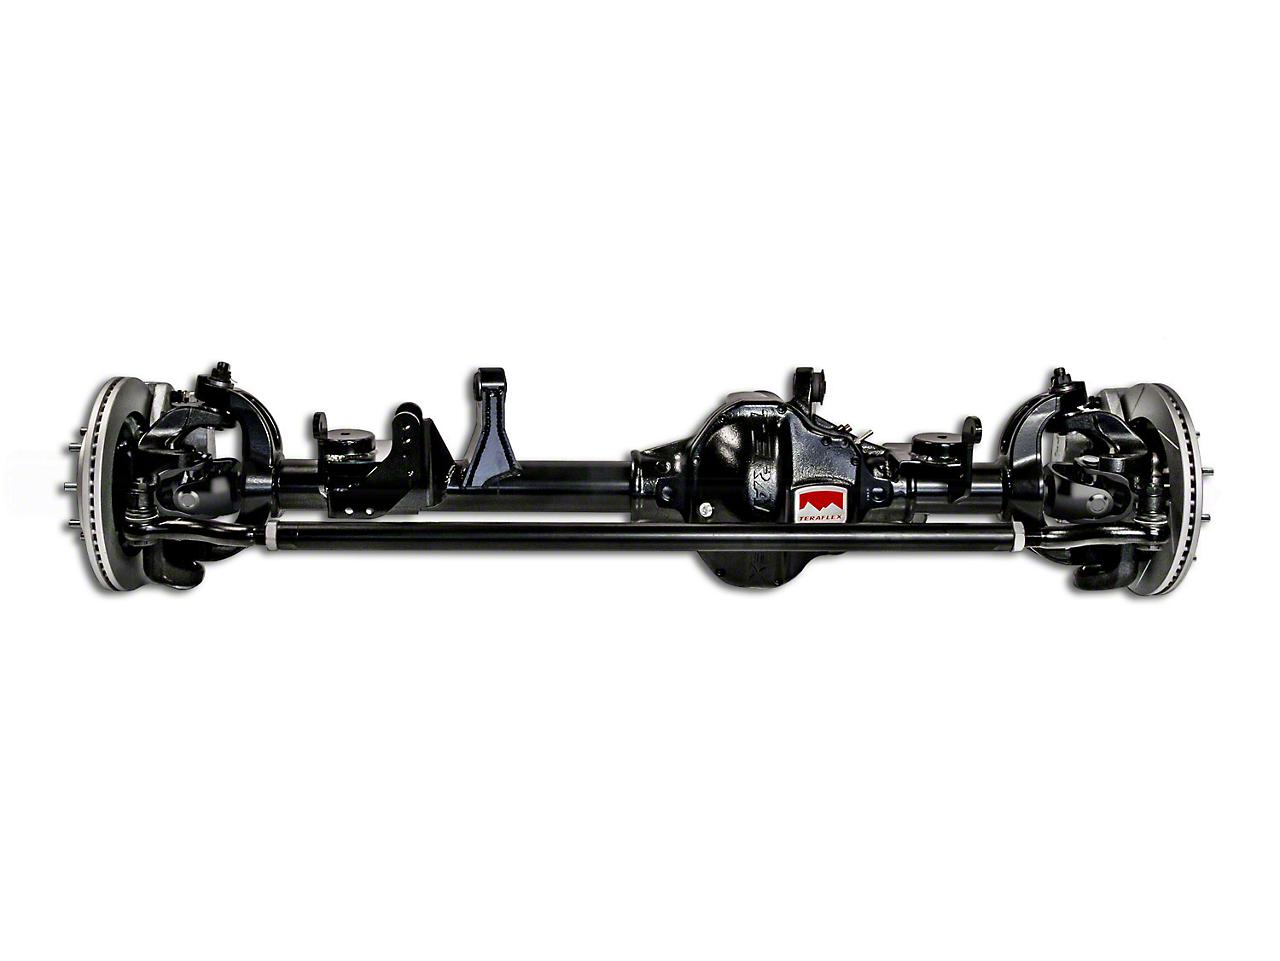 Teraflex Front Tera60 Unit Bearing Axle w/ 4.88 Gears (07-18 Wrangler JK)